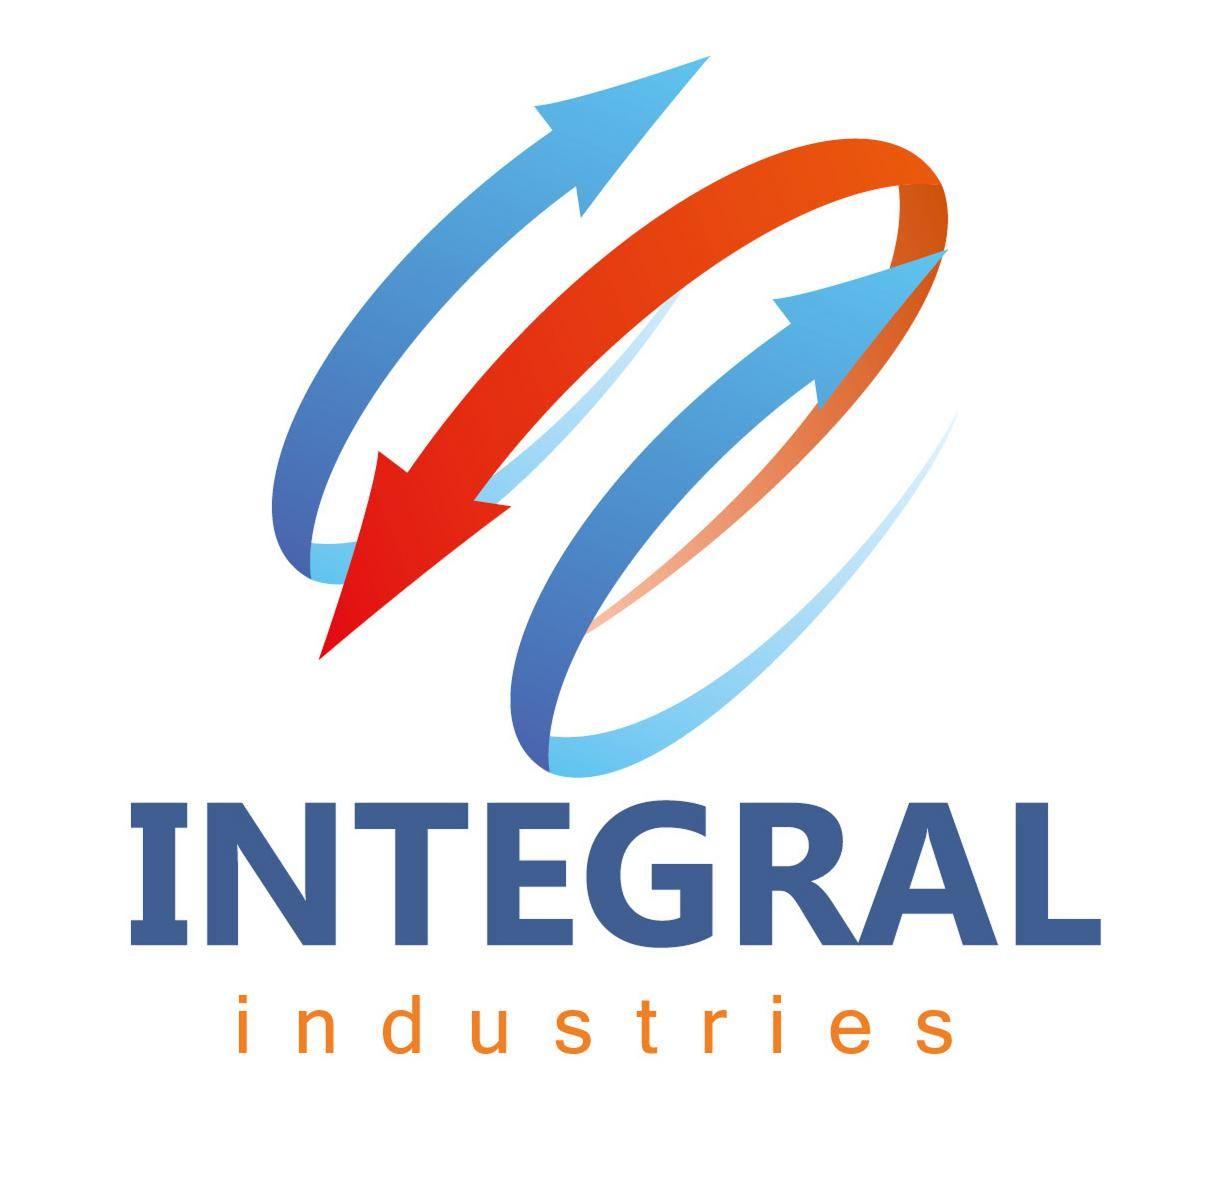 INTEGRAL Industries